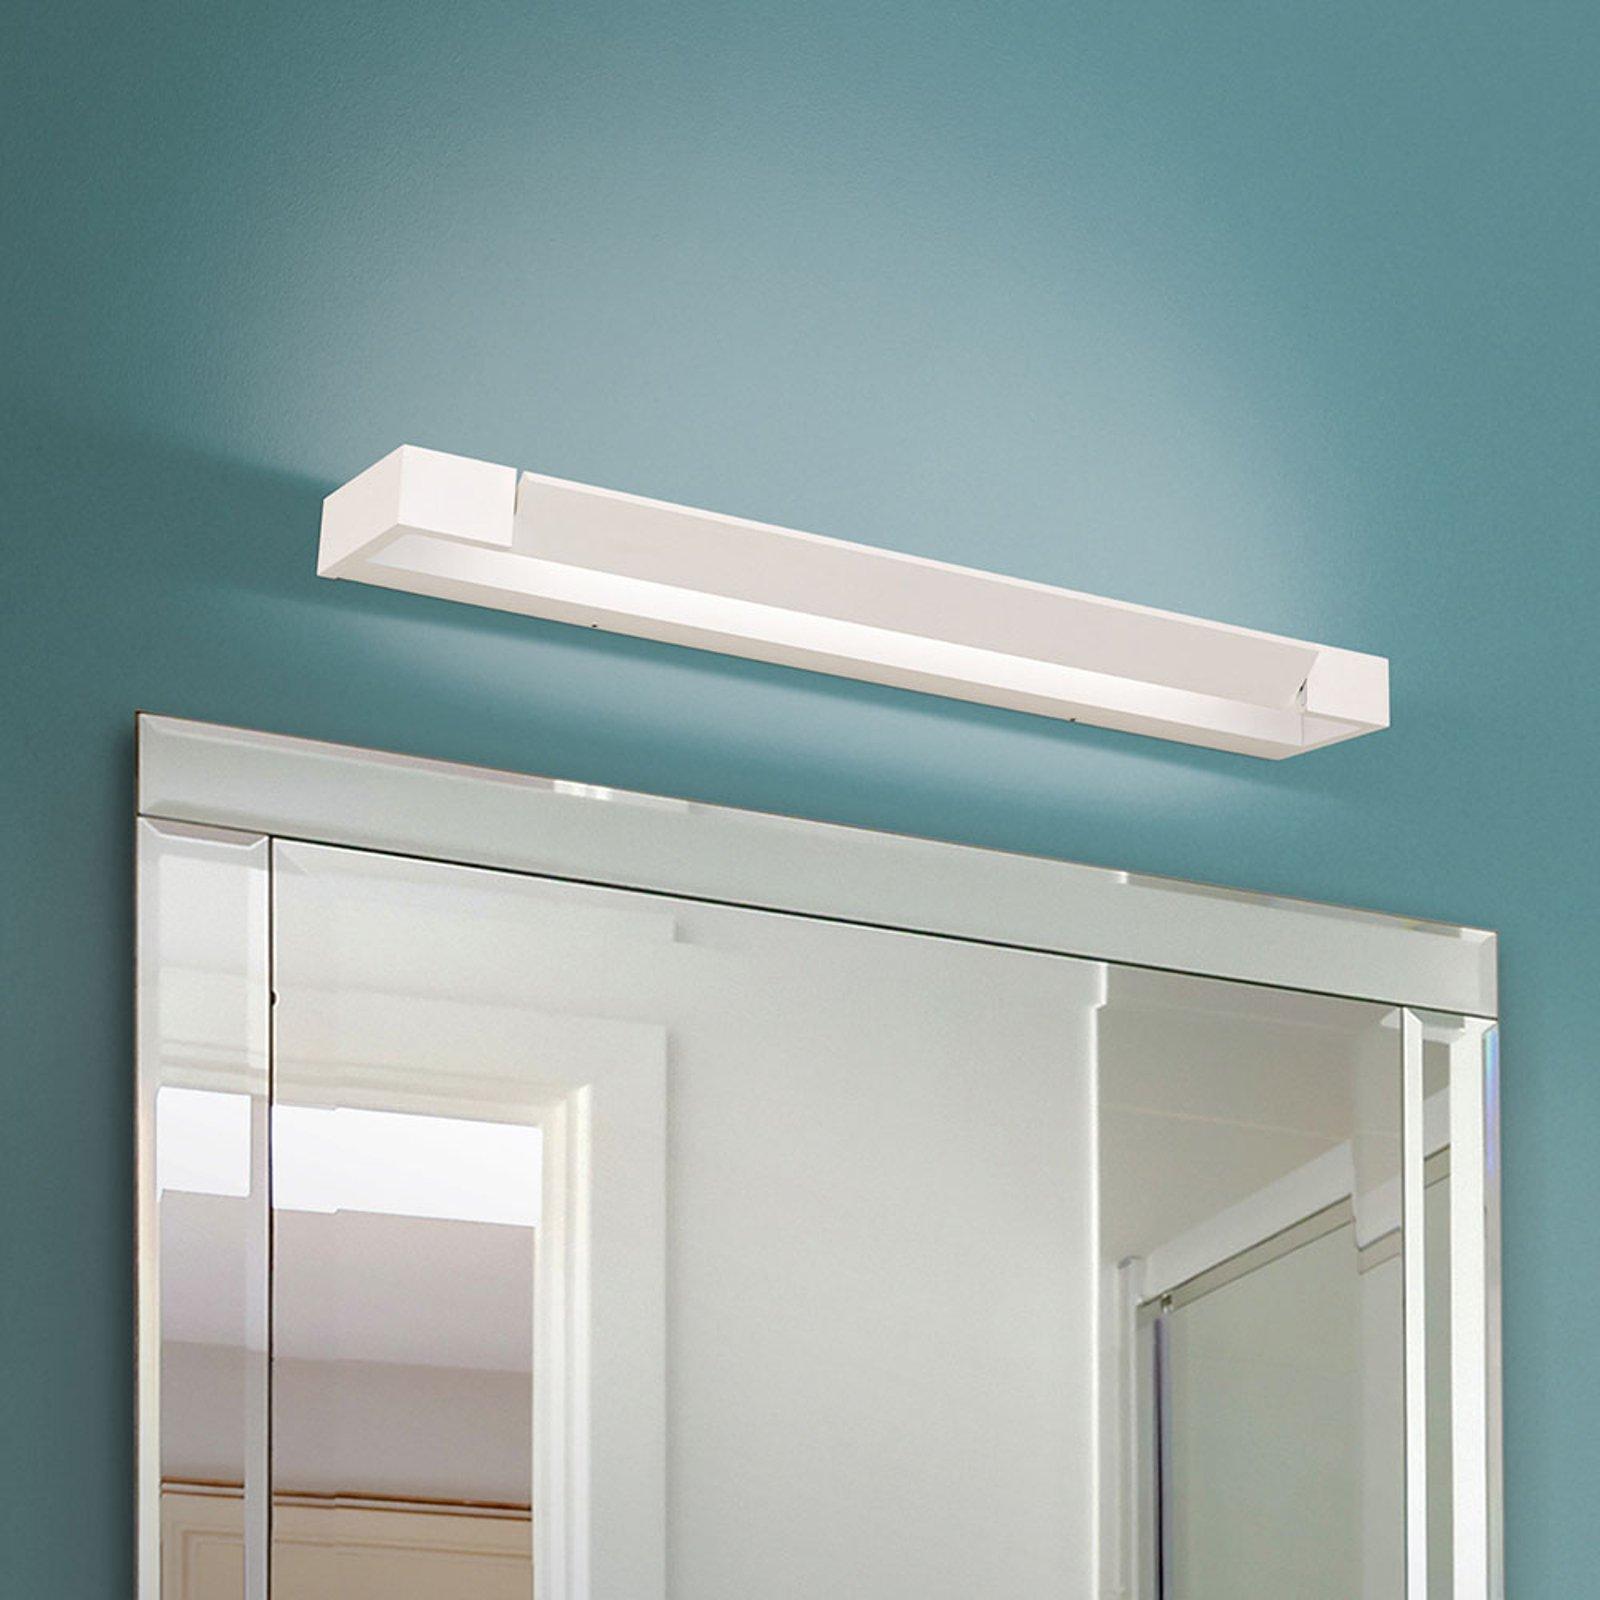 LED-speillampe Marilyn, hvit, svingbar 60 cm